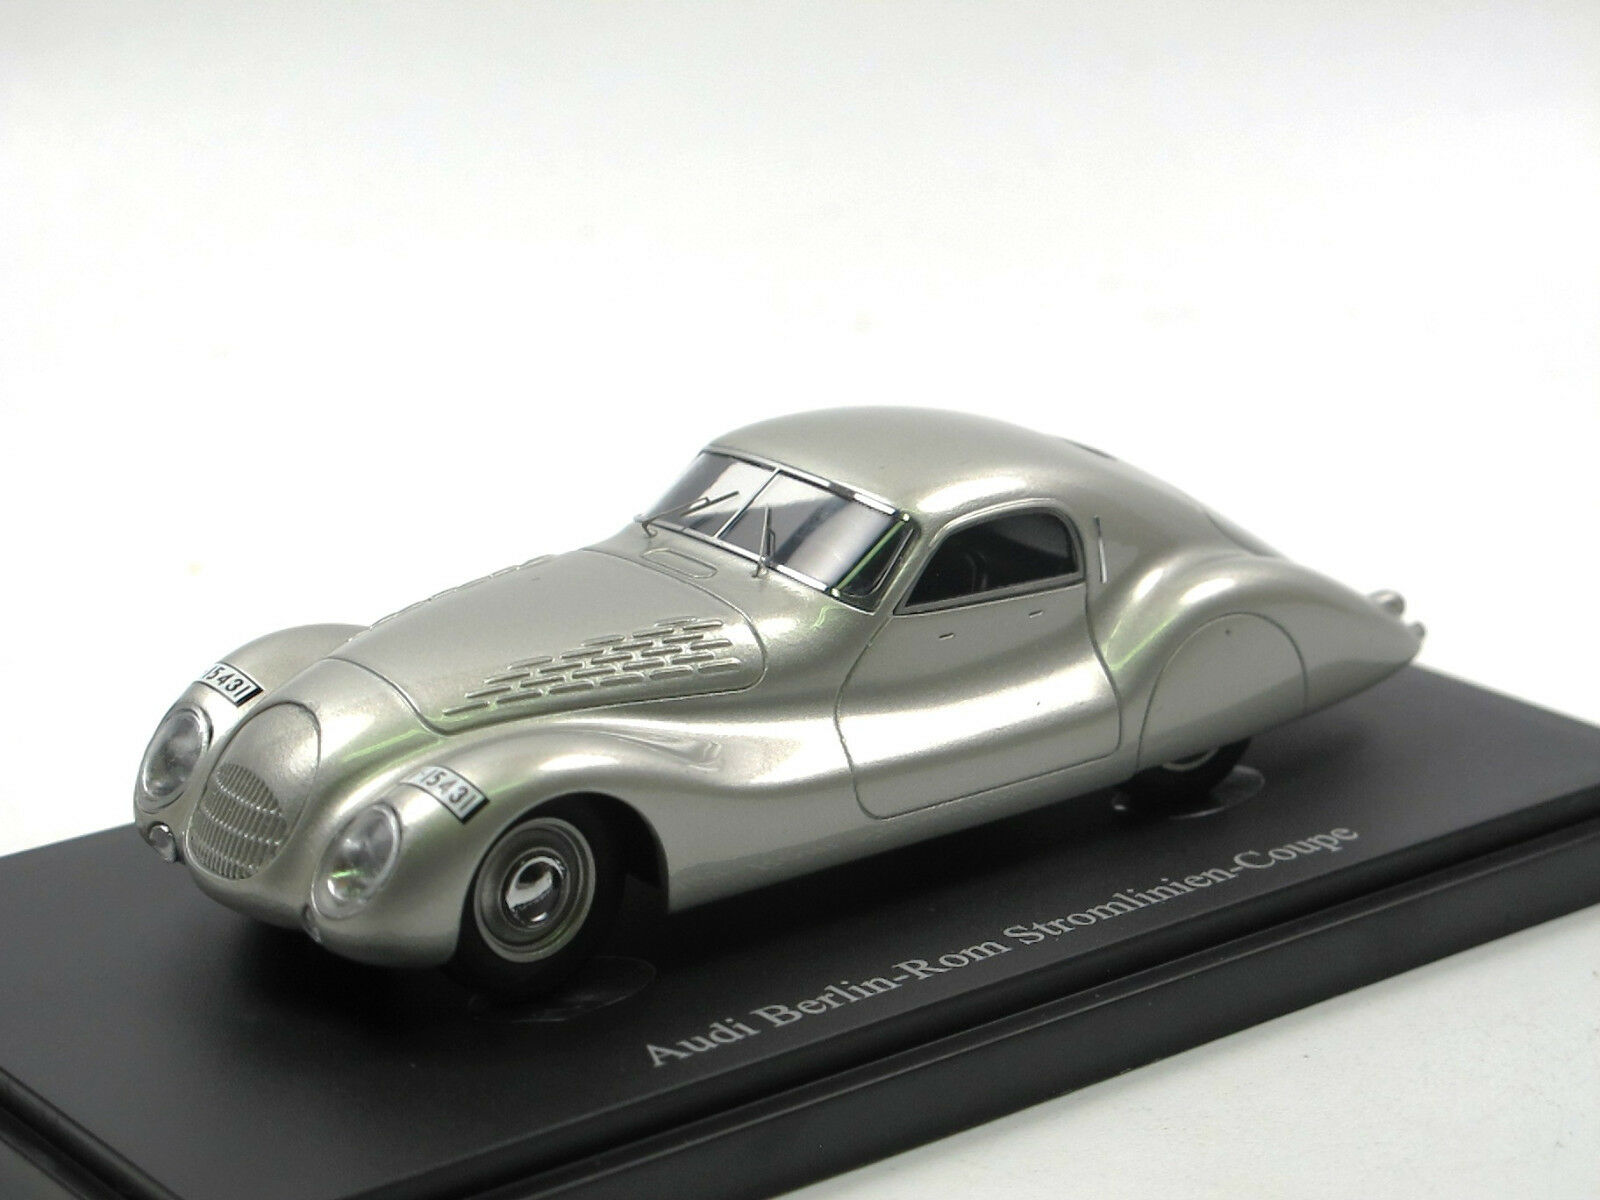 Autocult 04018 - 1936 audi stromlinien coupé - silber - berlin - 1 43 begrenzt